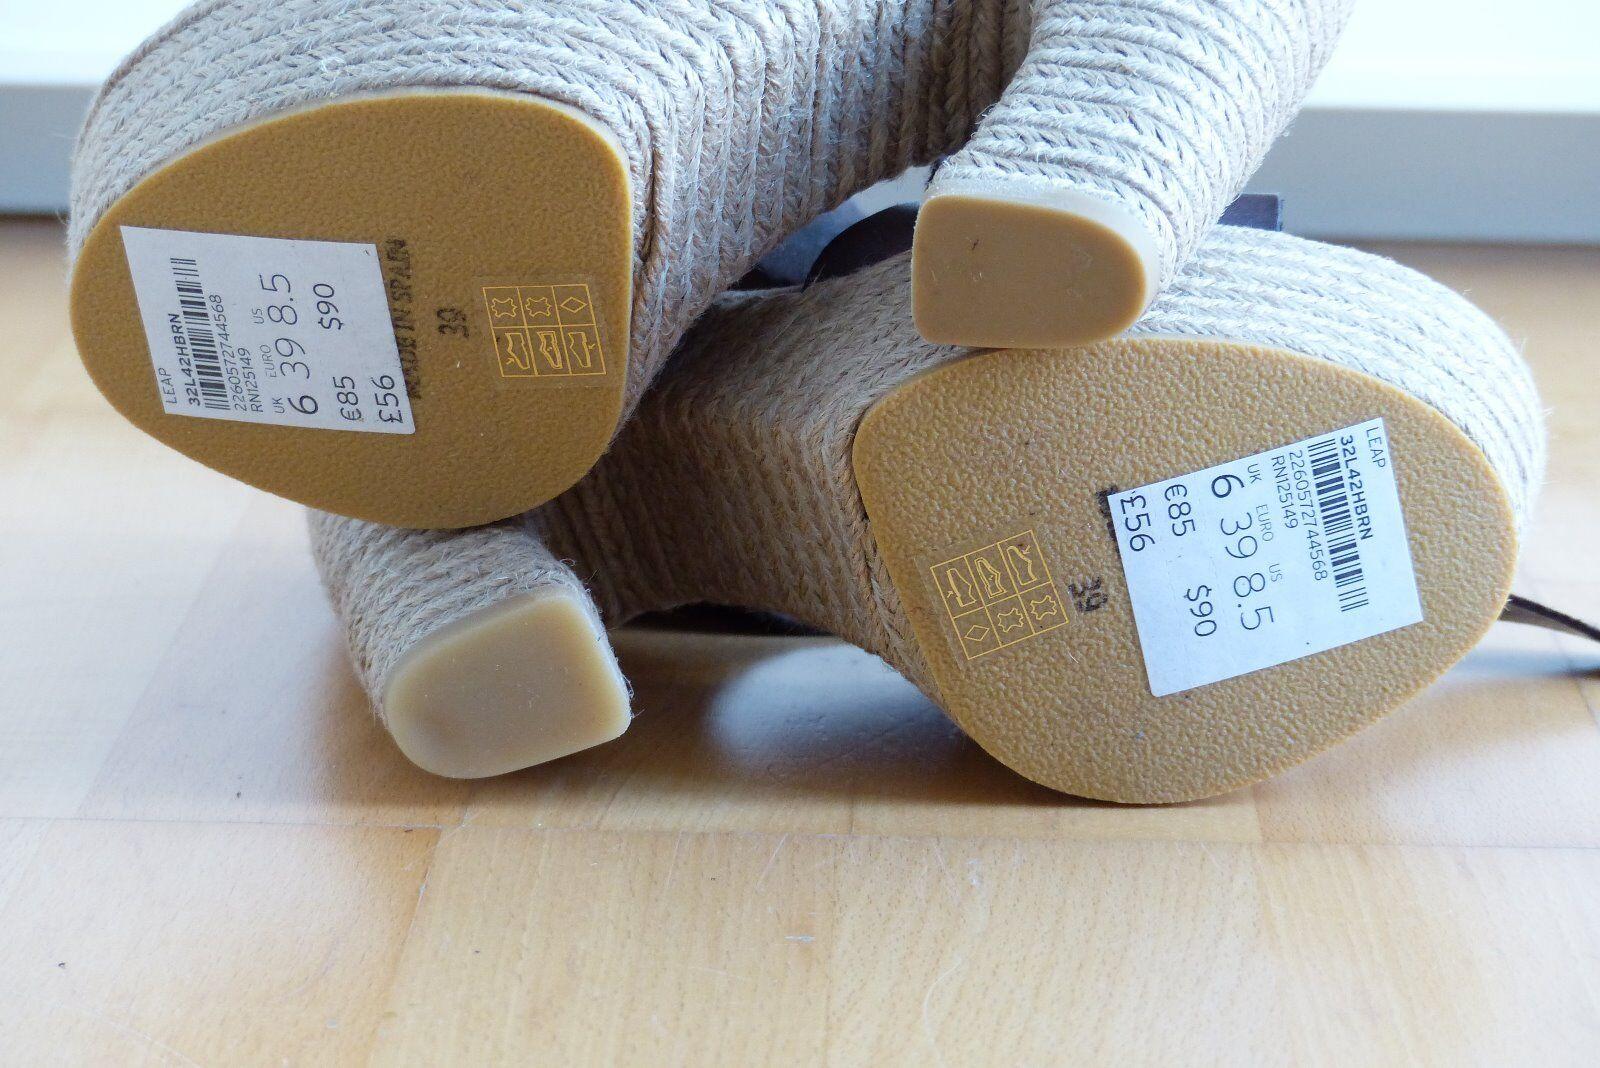 Topshop Sandaletten Sandales Bast Leder braun UK Gr. 39 UK braun 6 87824f